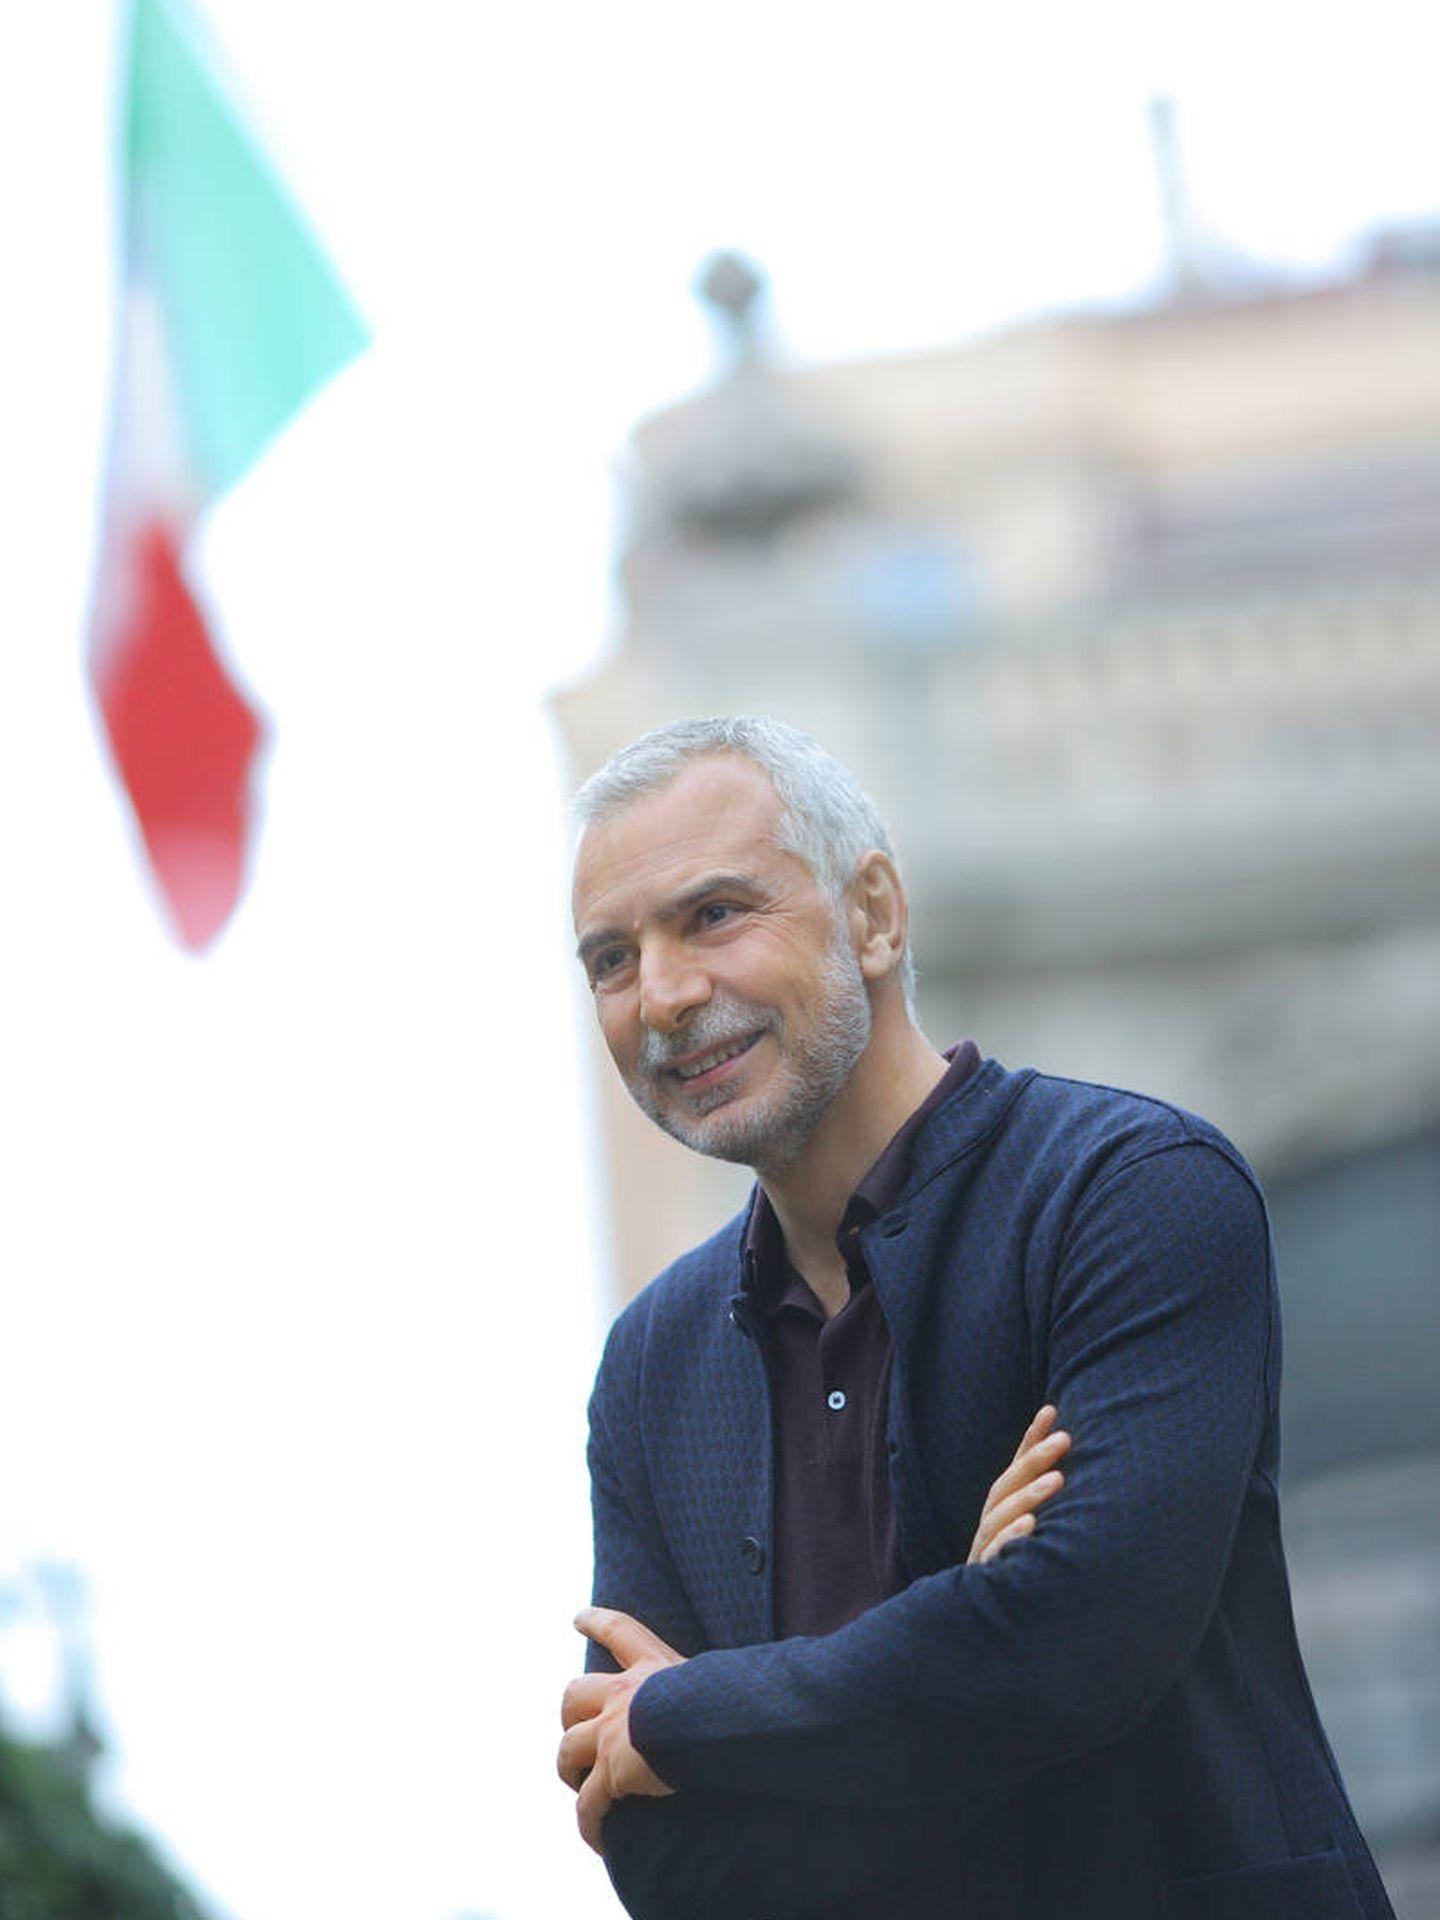 Sannino, frente a la embajada italiana en Madrid. (DR)